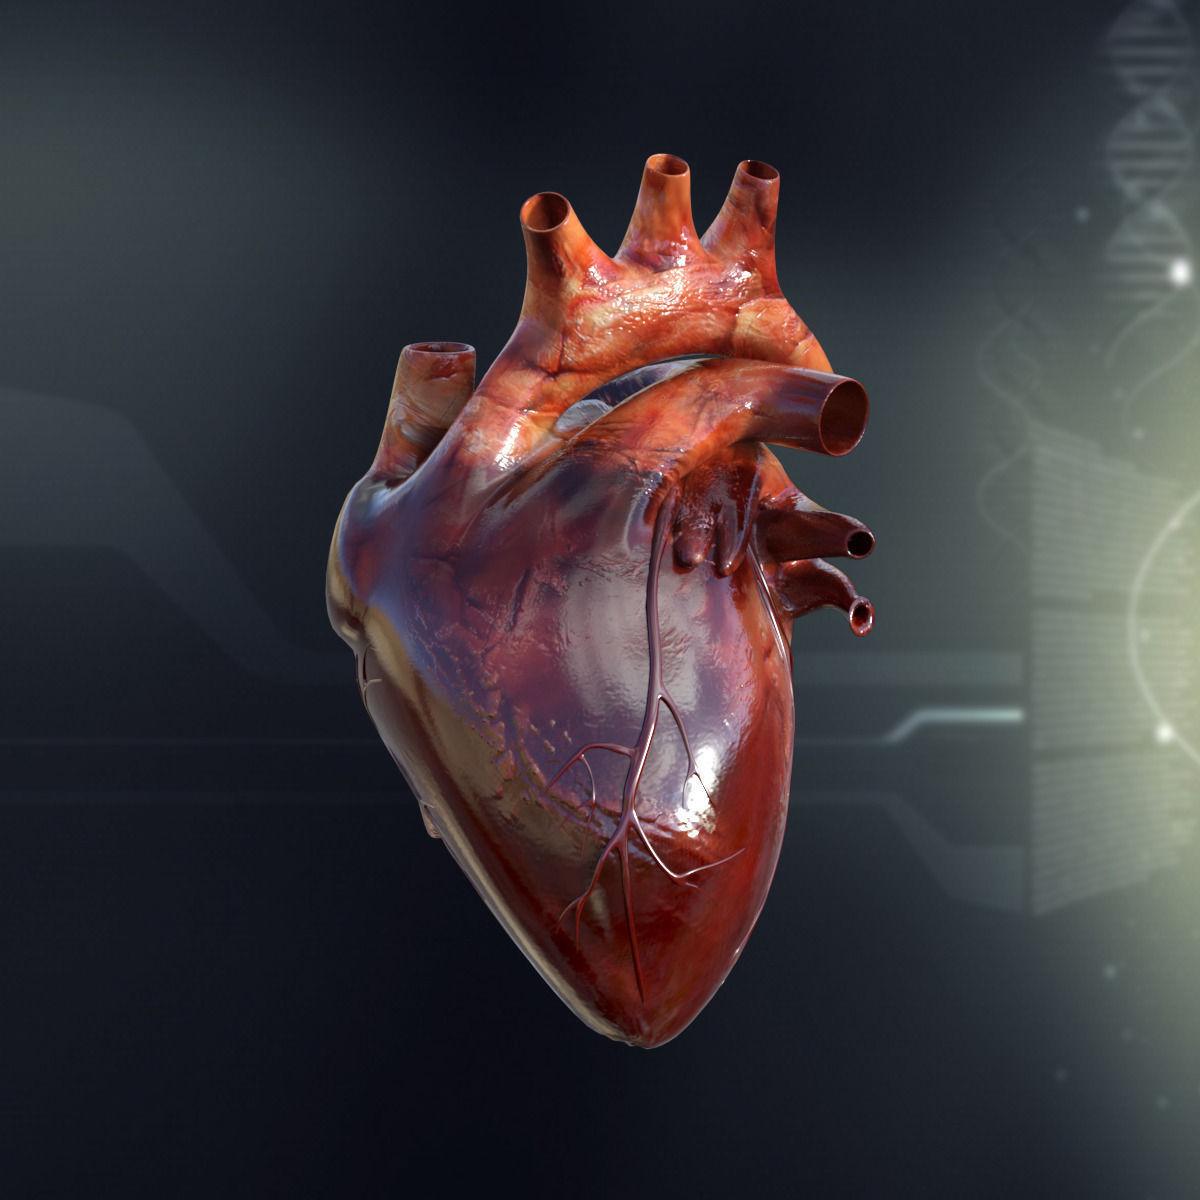 3d human heart anatomy cgtrader human heart anatomy 3d model max obj 3ds fbx c4d lwo lw lws 1 ccuart Choice Image